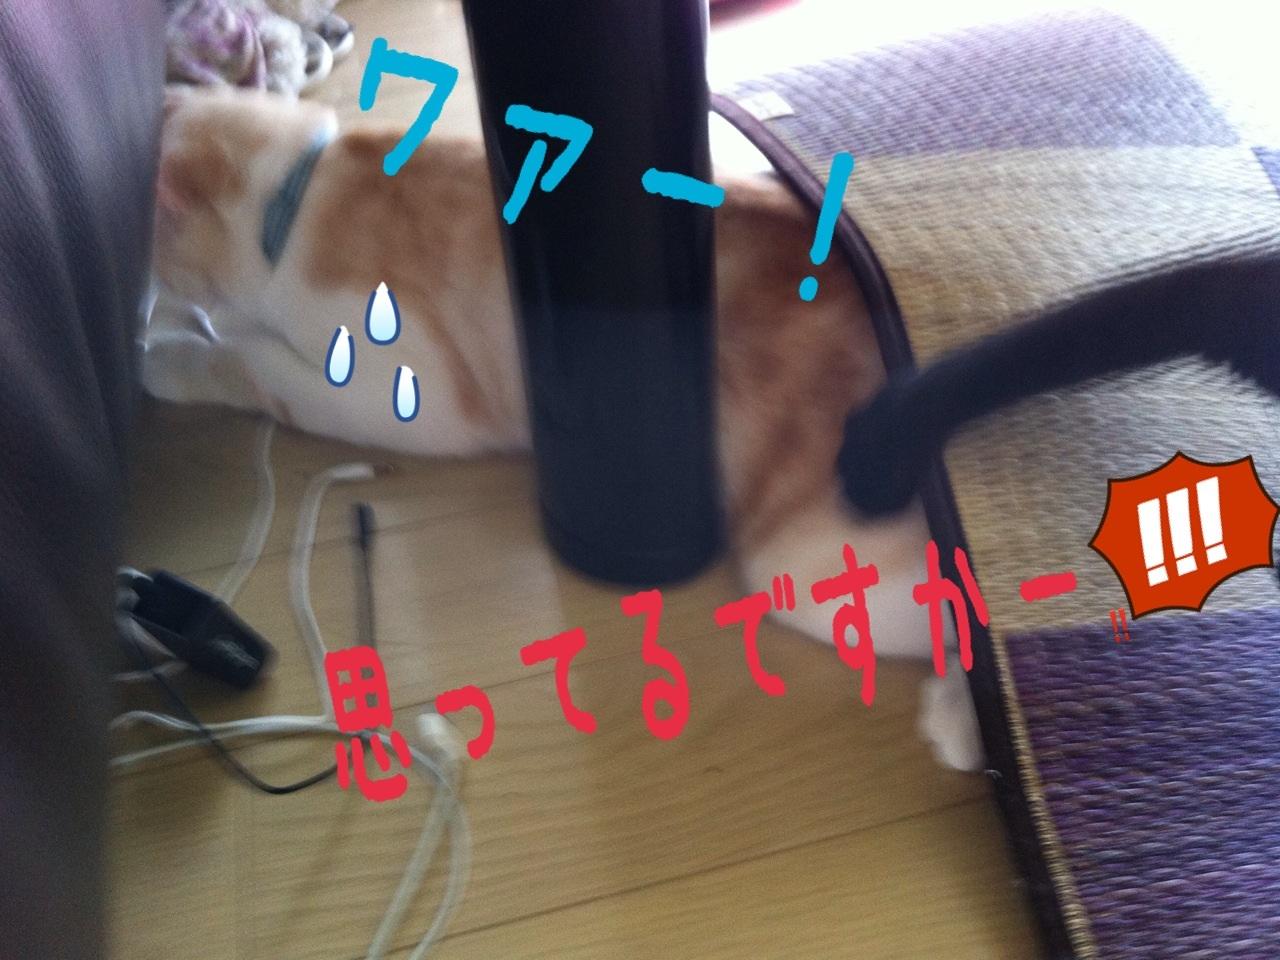 image_20130710222838.jpg